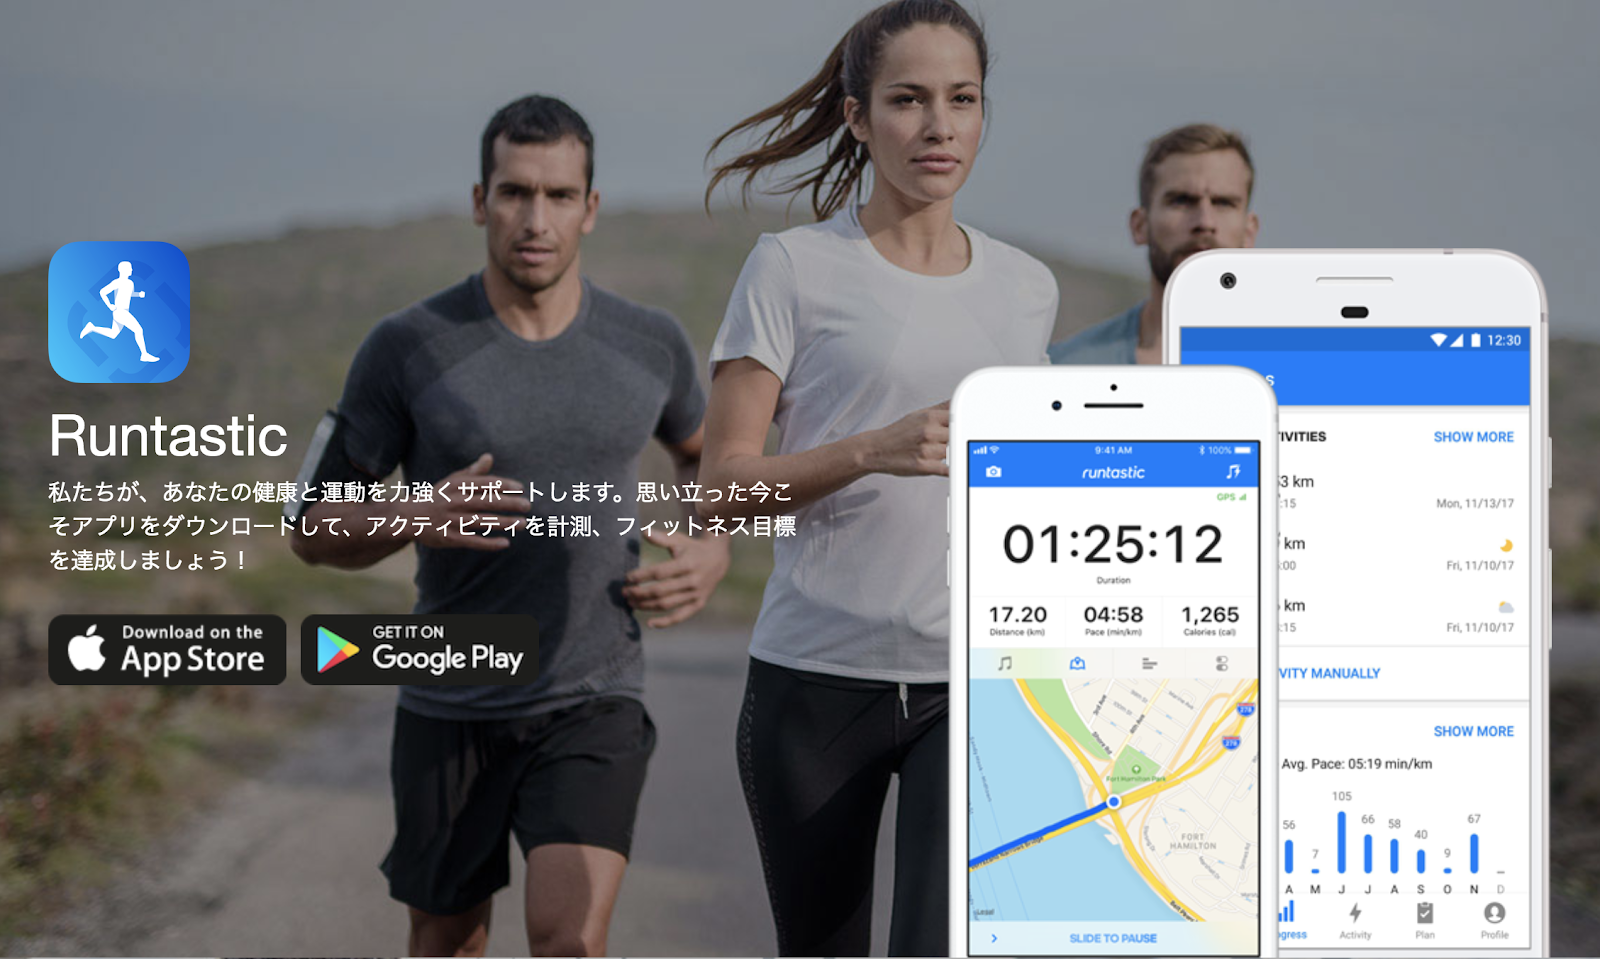 https://itunes.apple.com/jp/app/runtastic-pro-ランニング-ウォーキング/id366626332?mt=8